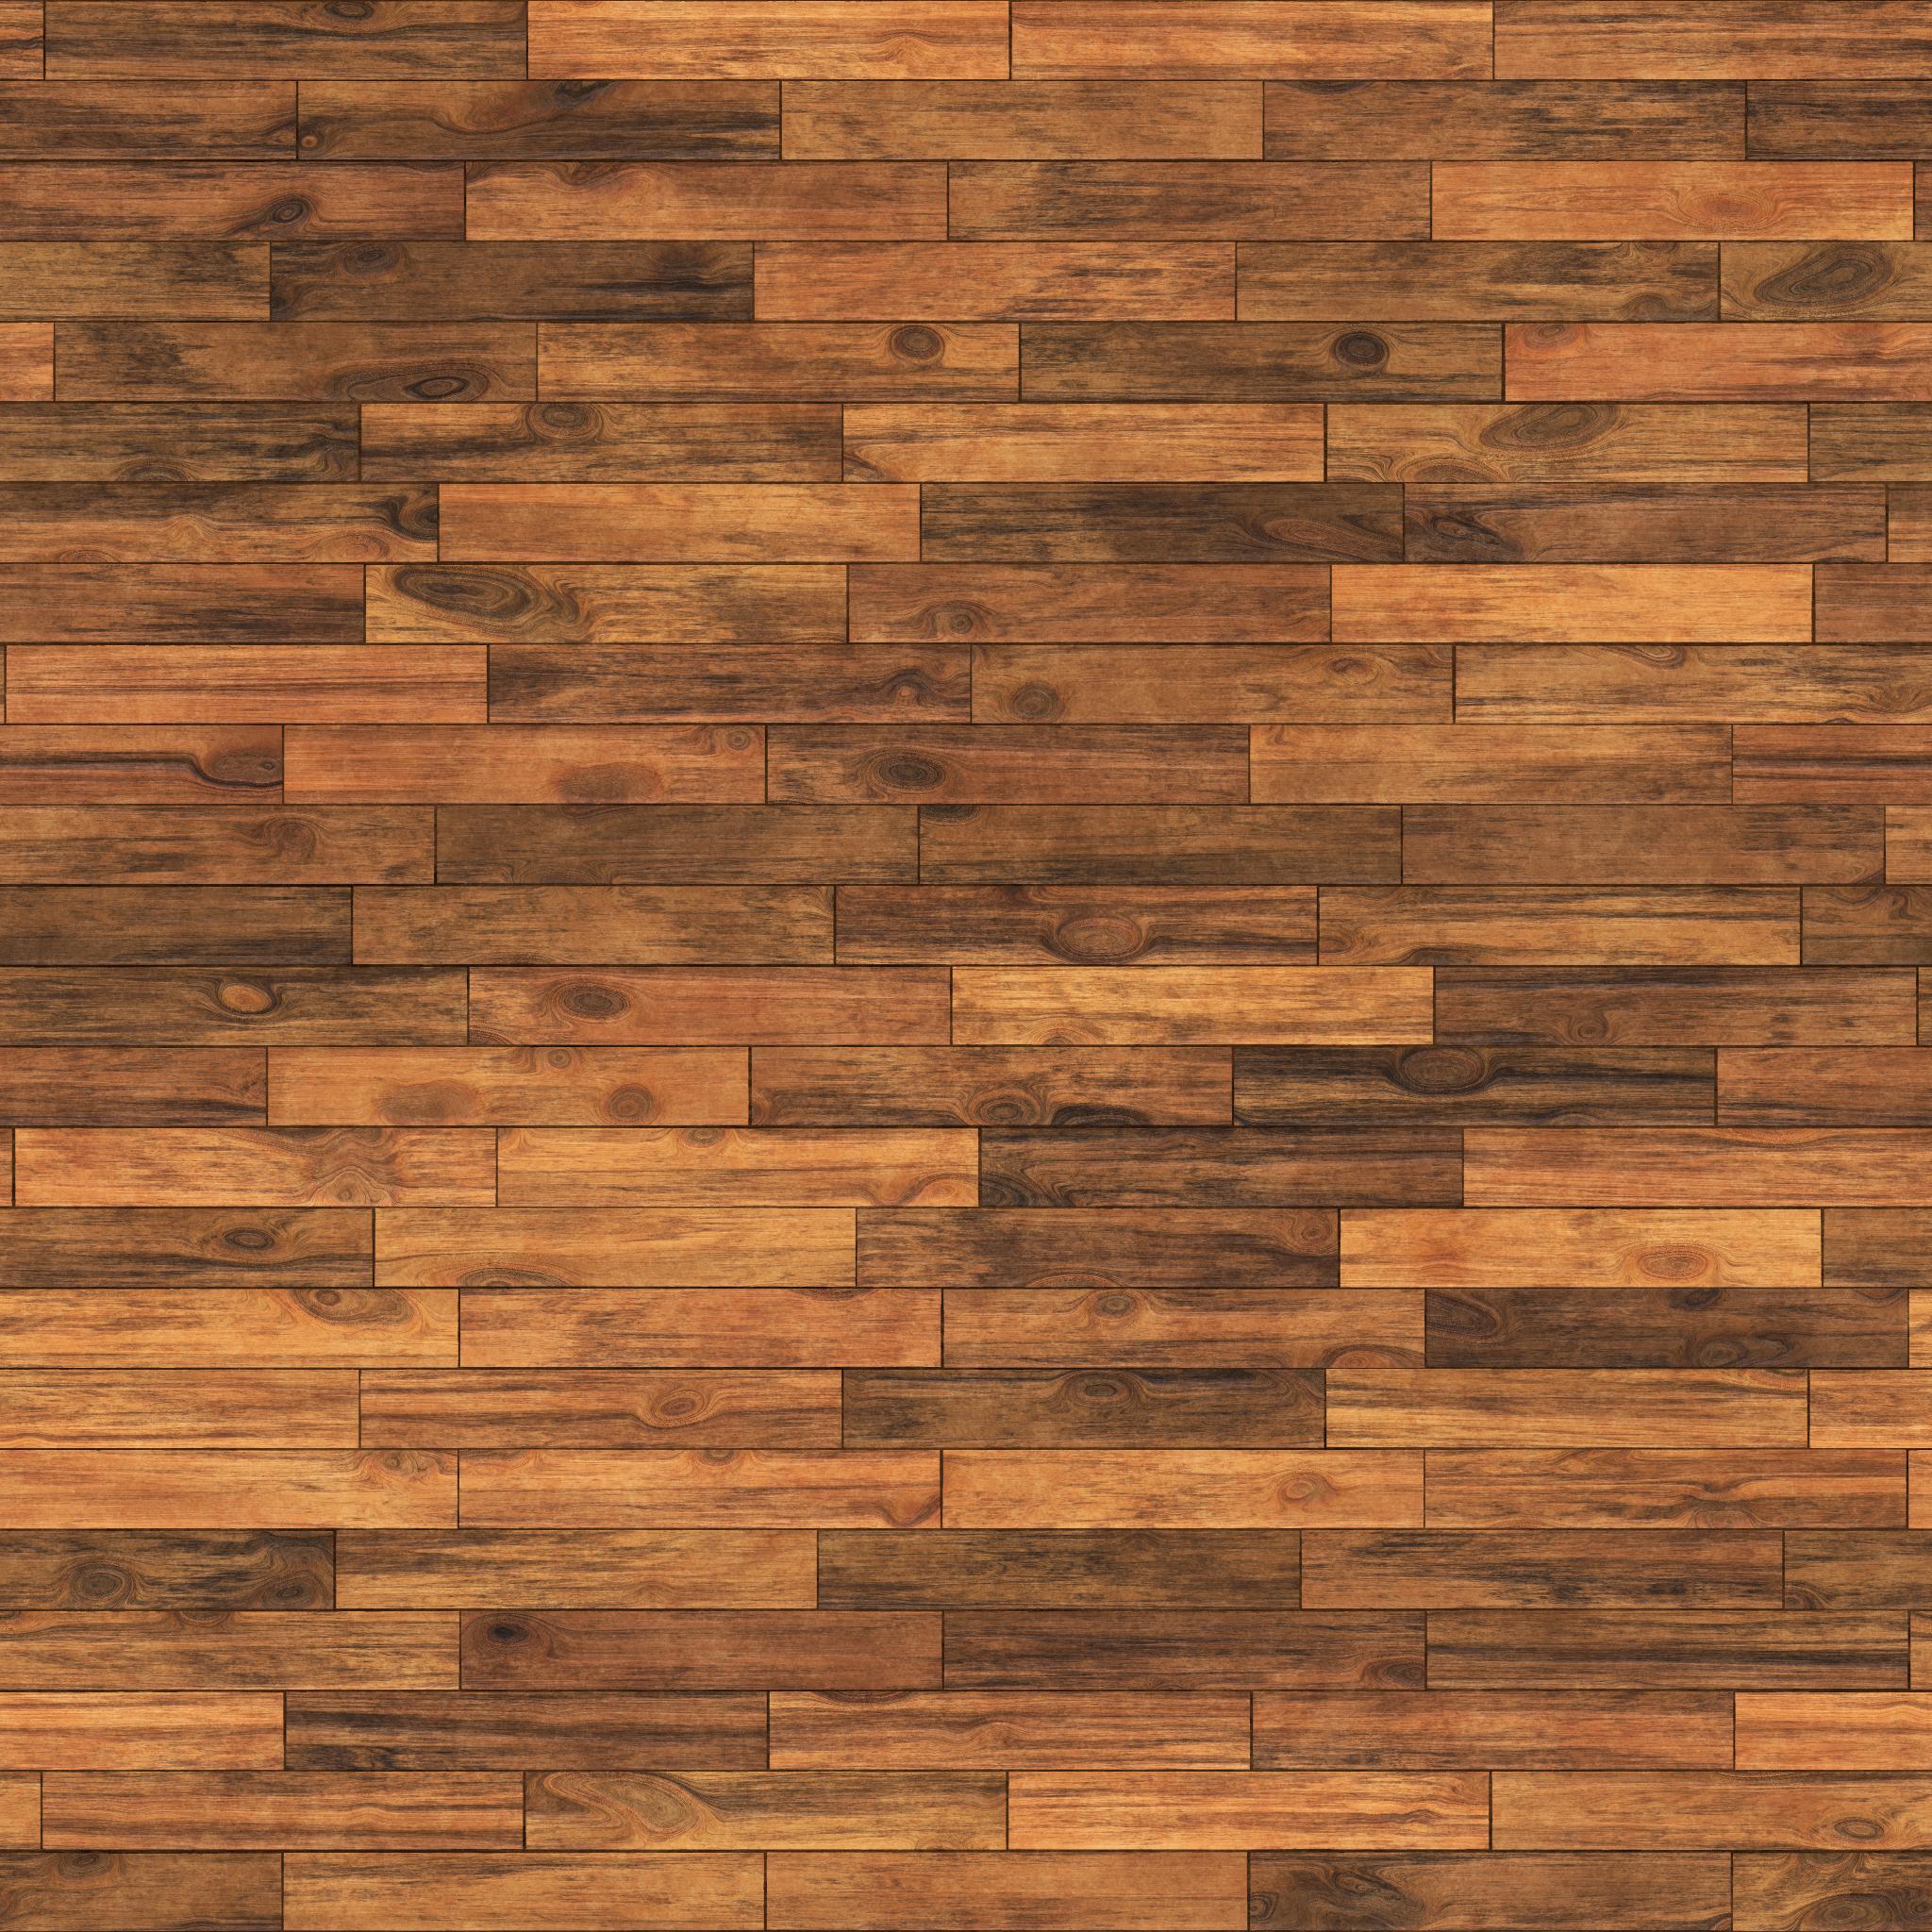 Wood Planet Quotes Quotesgram